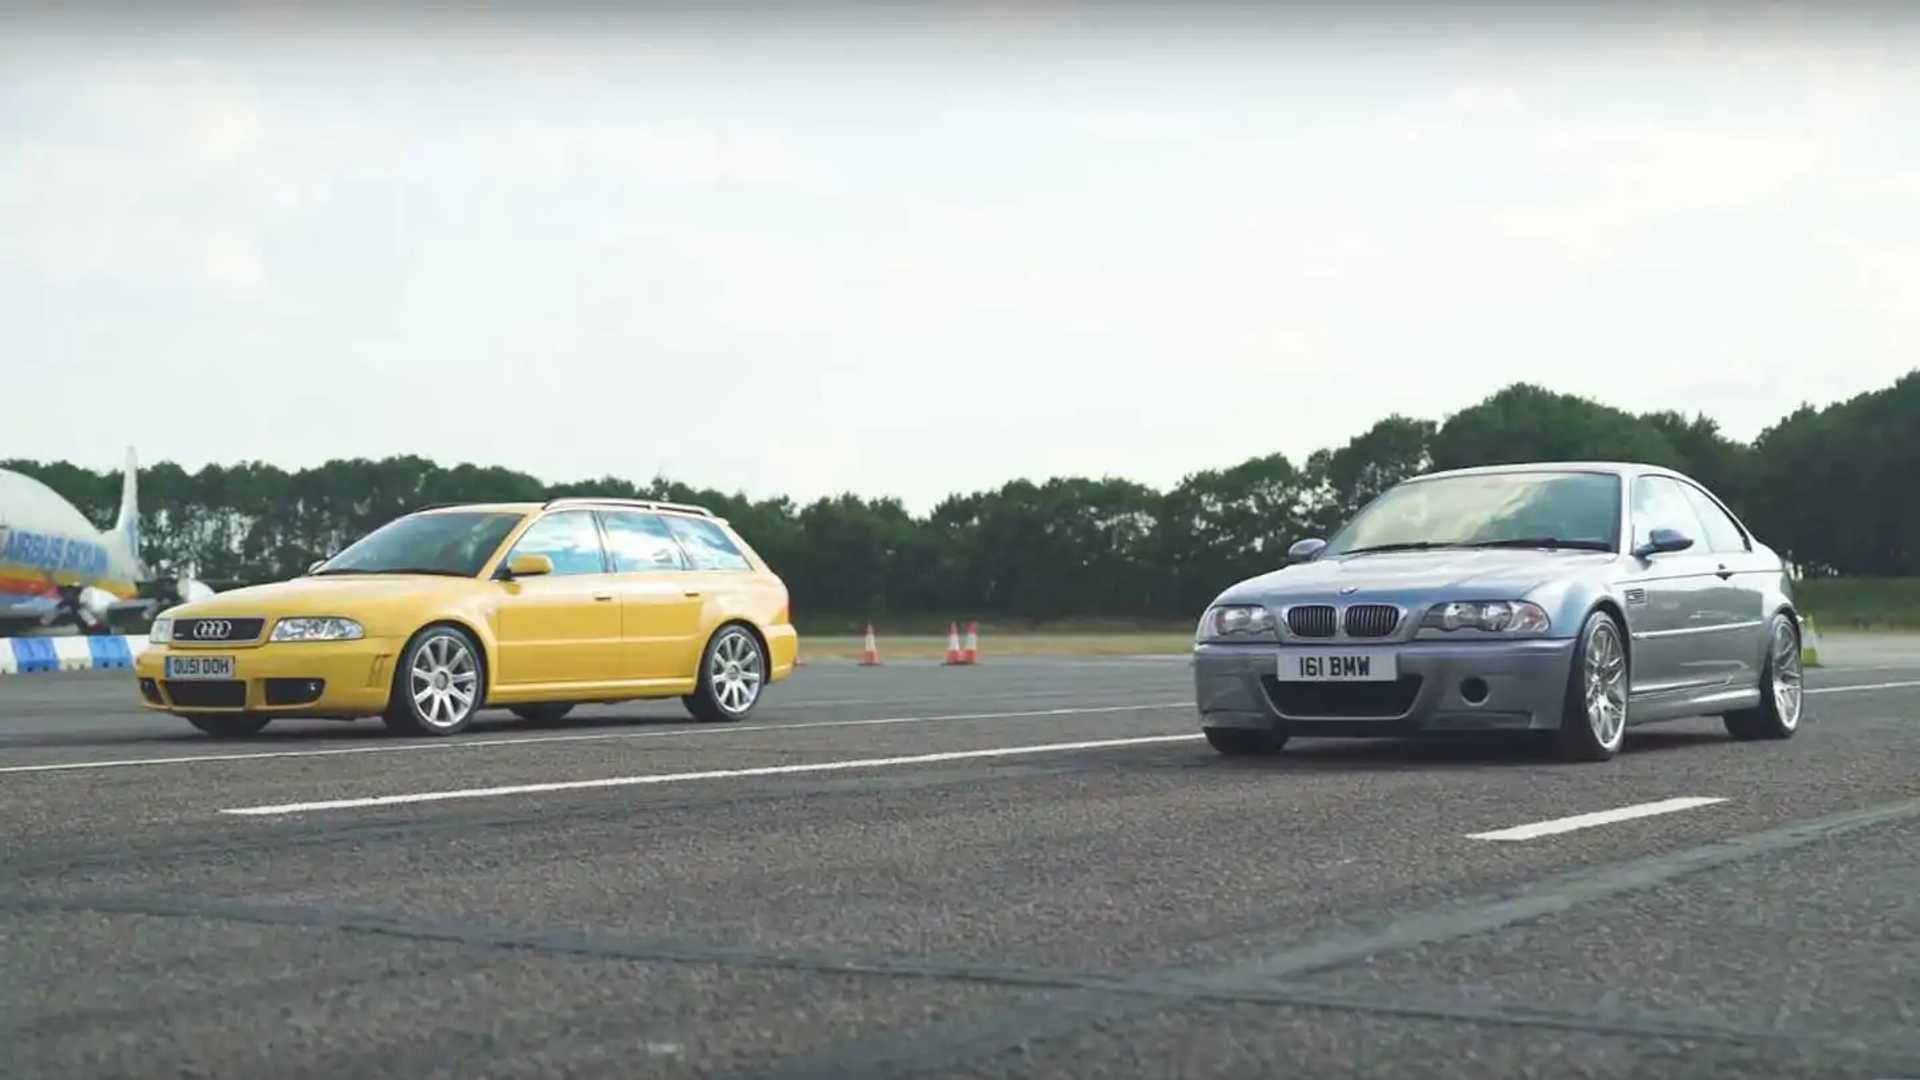 Bmw E46 M3 >> Bmw E46 M3 Csl Meets Audi Rs4 B5 At Drag Strip